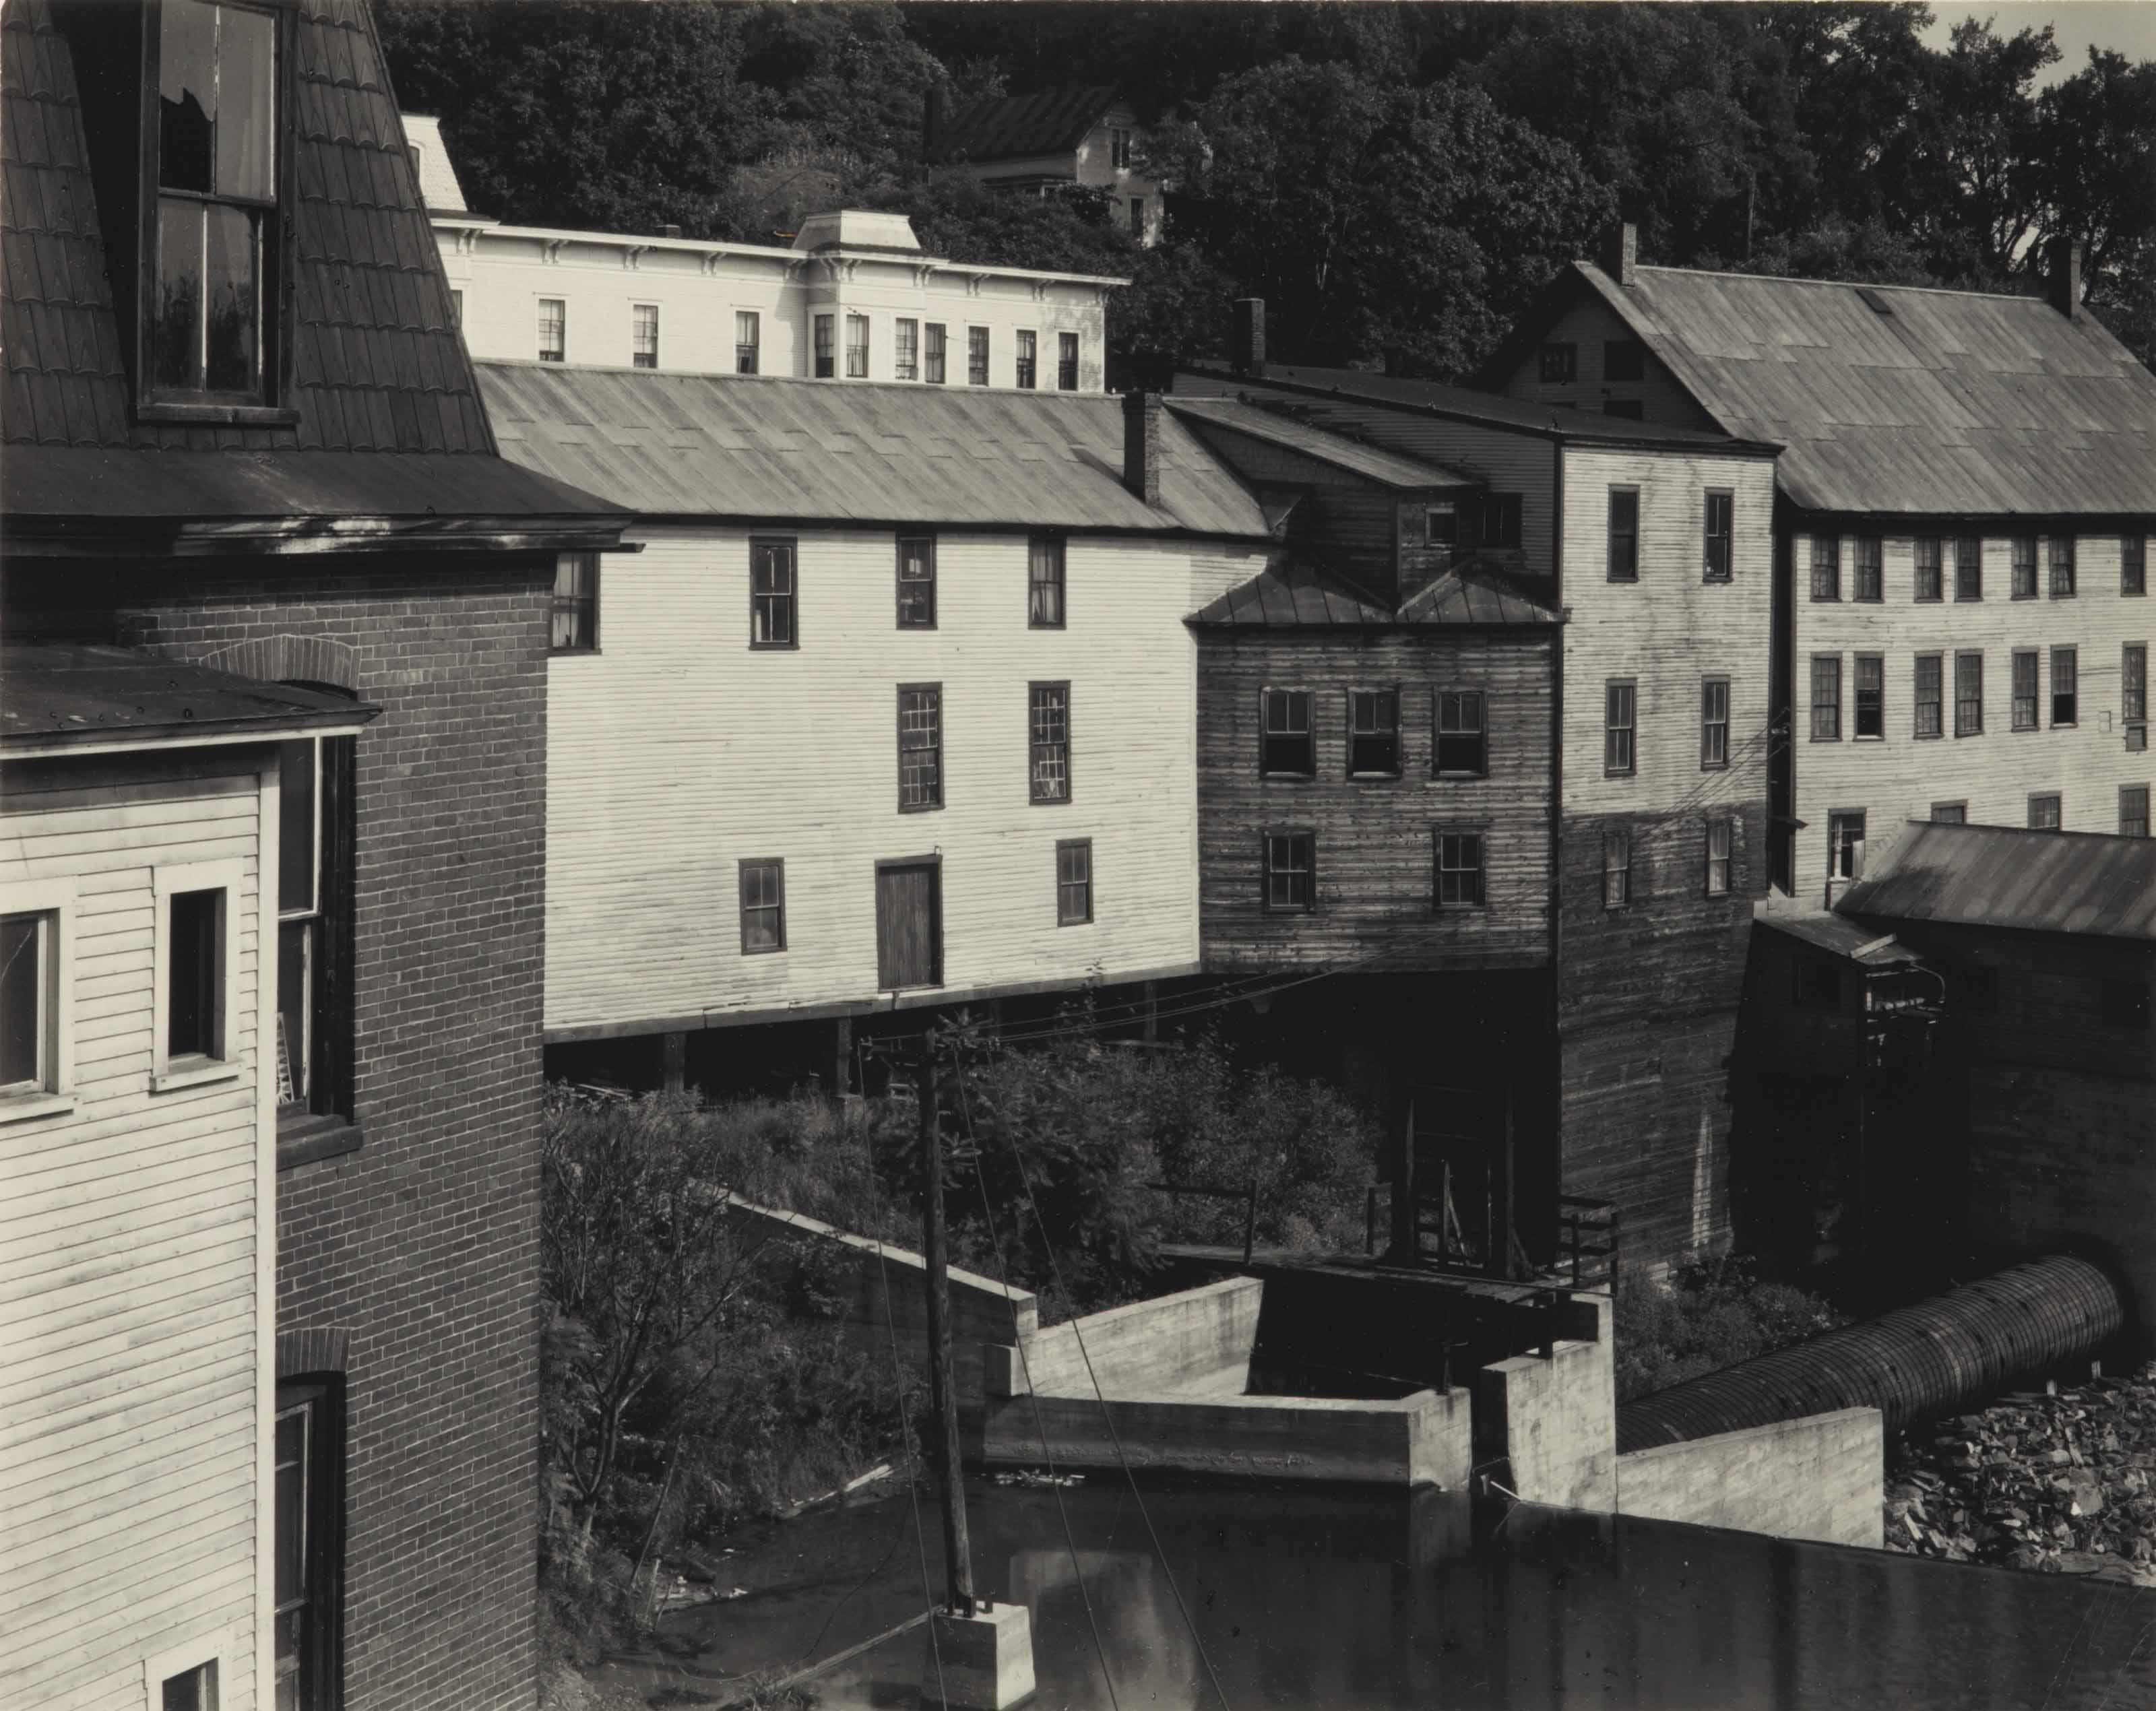 Mill Dam, New England, 1945